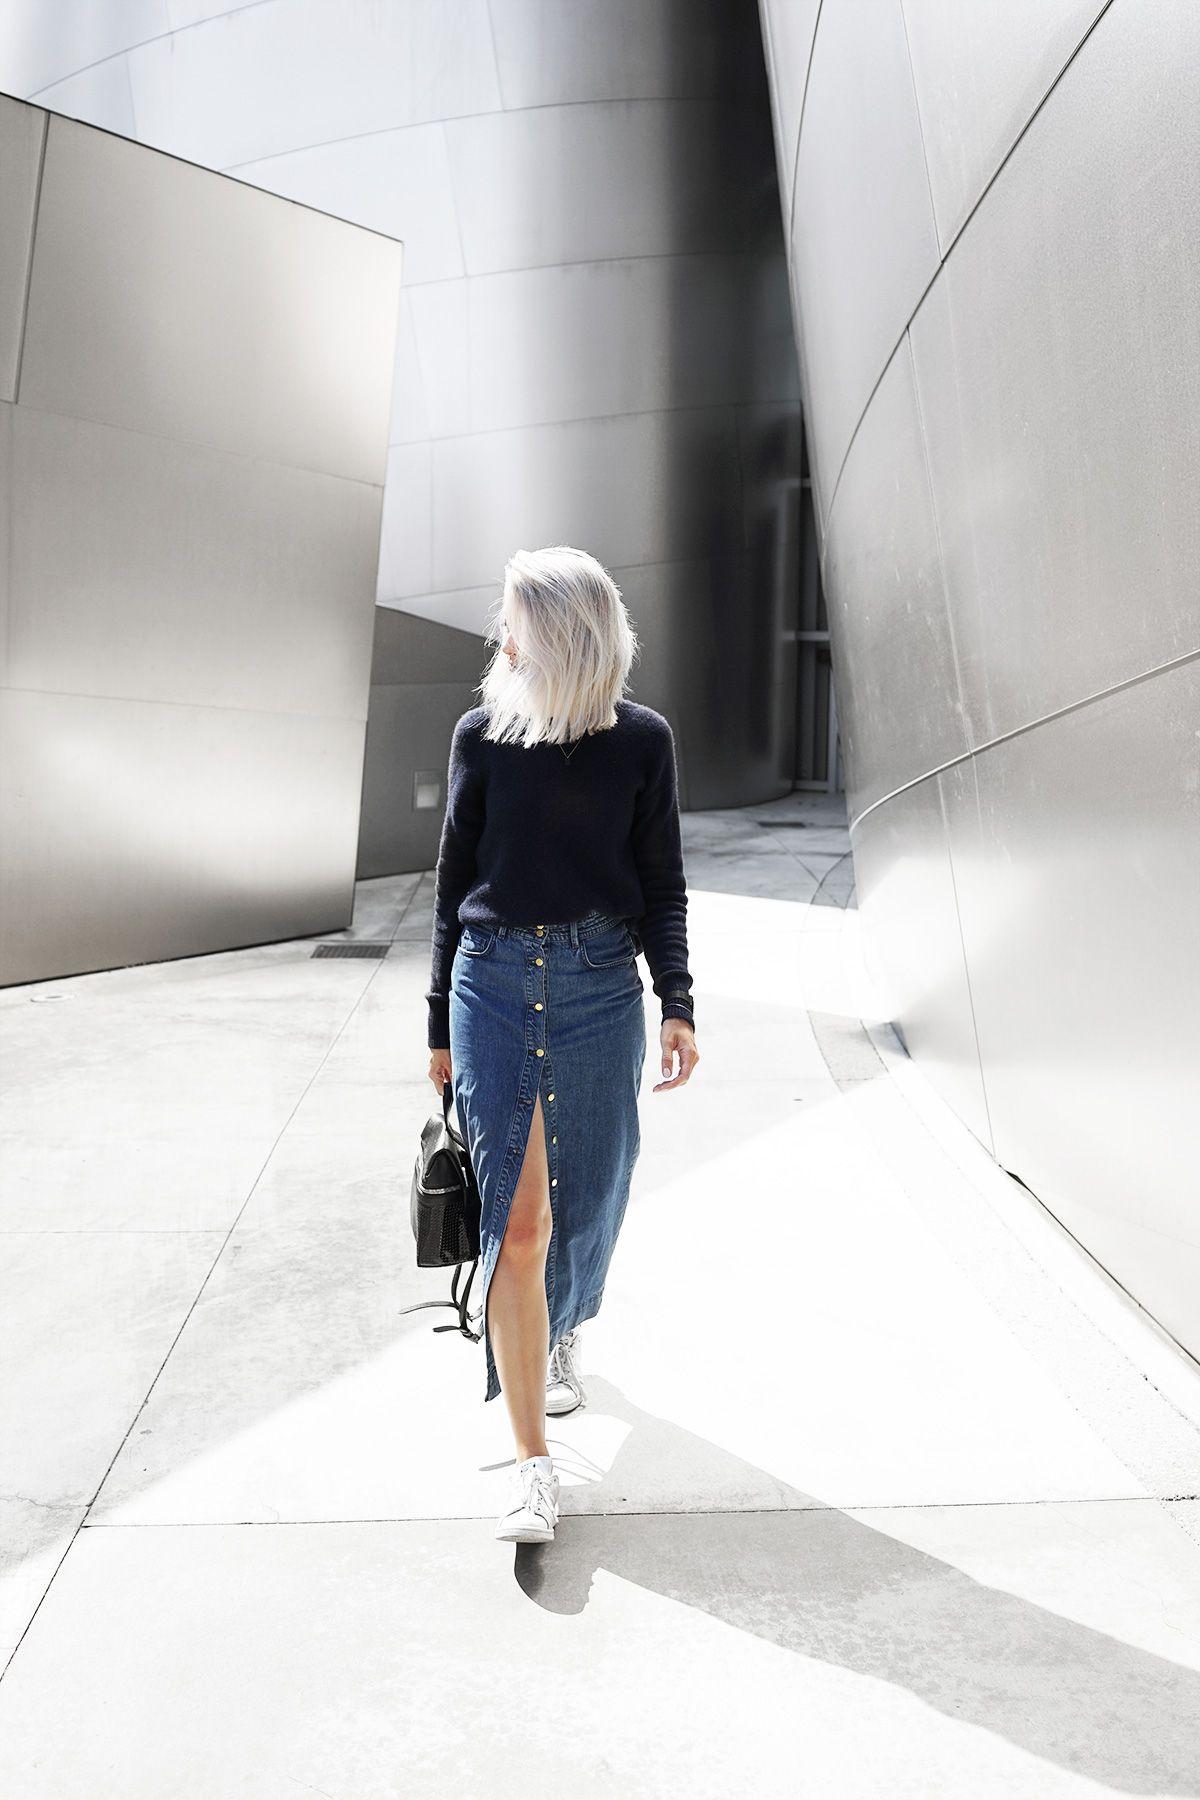 12f4678dfb joycecroonen dresses for LA cool in an H M long blue denim skirt ...